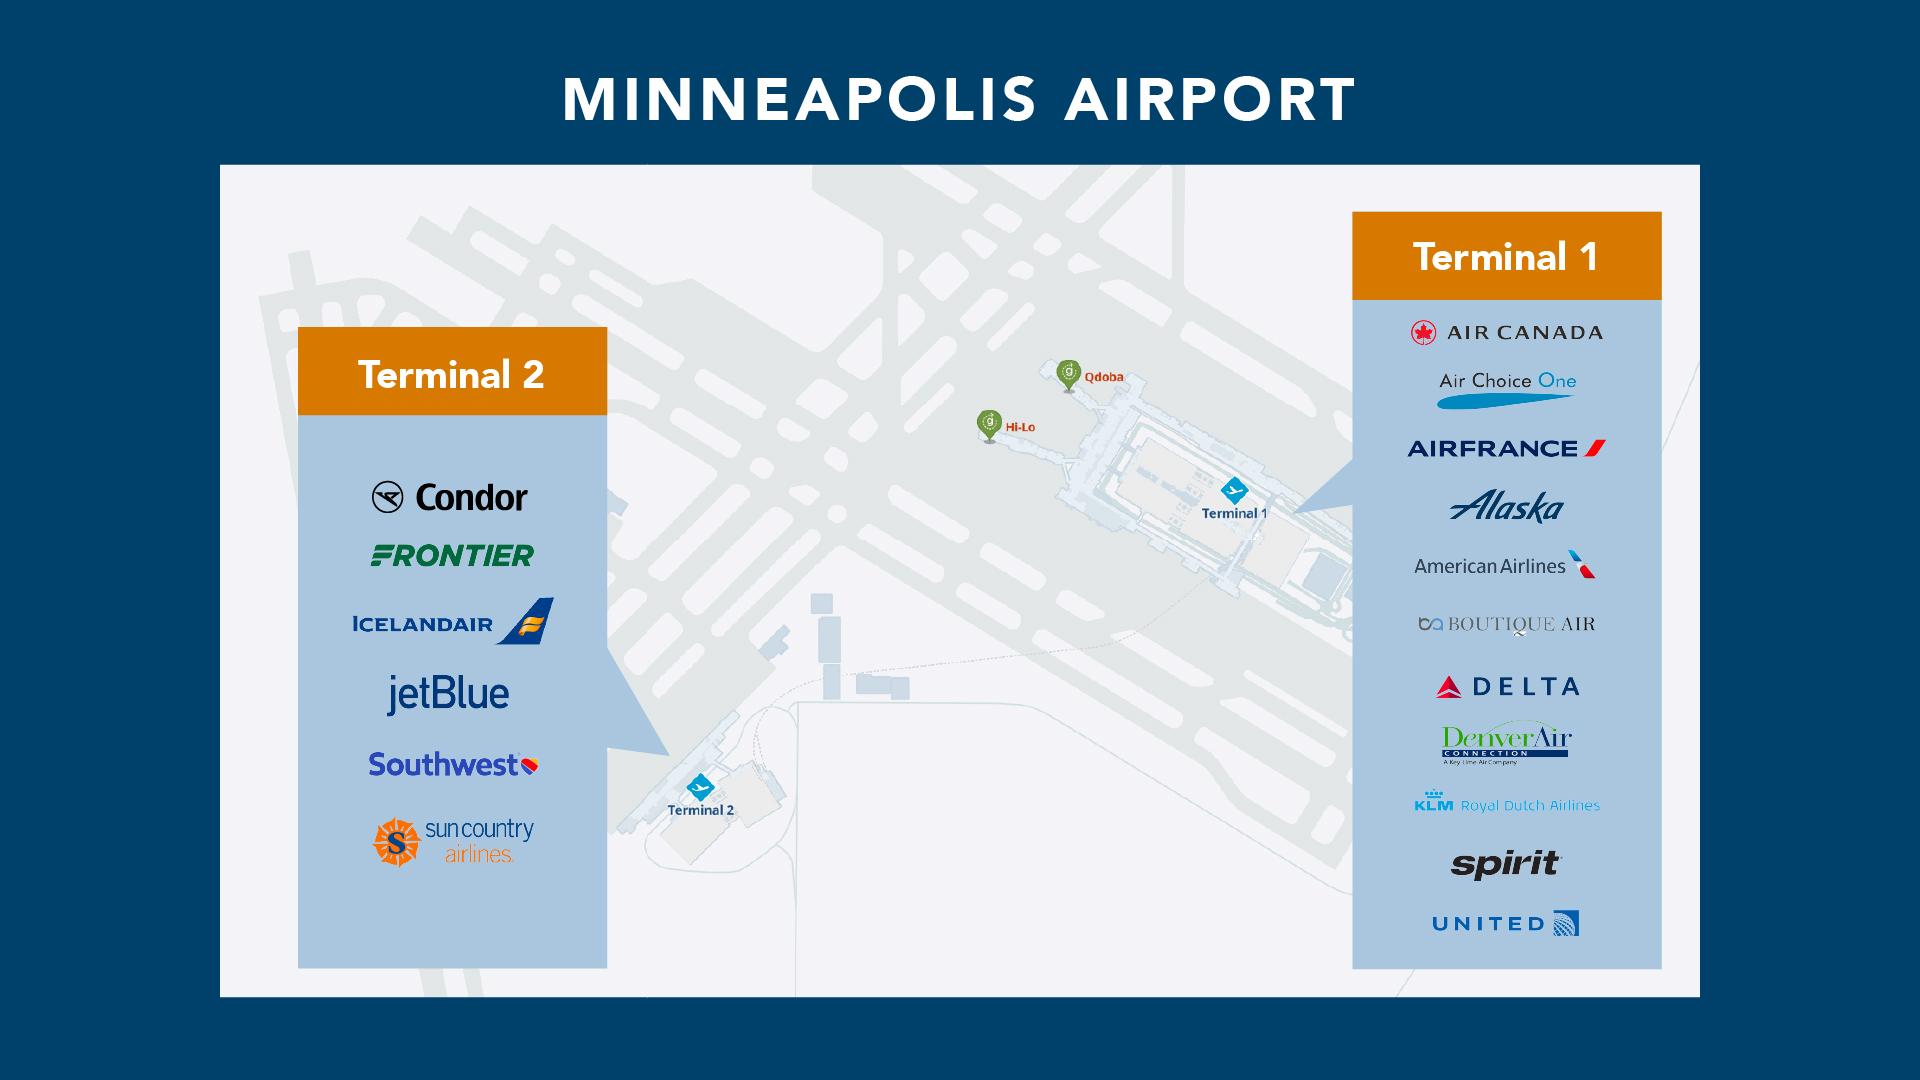 Minneapolis airport terminal map